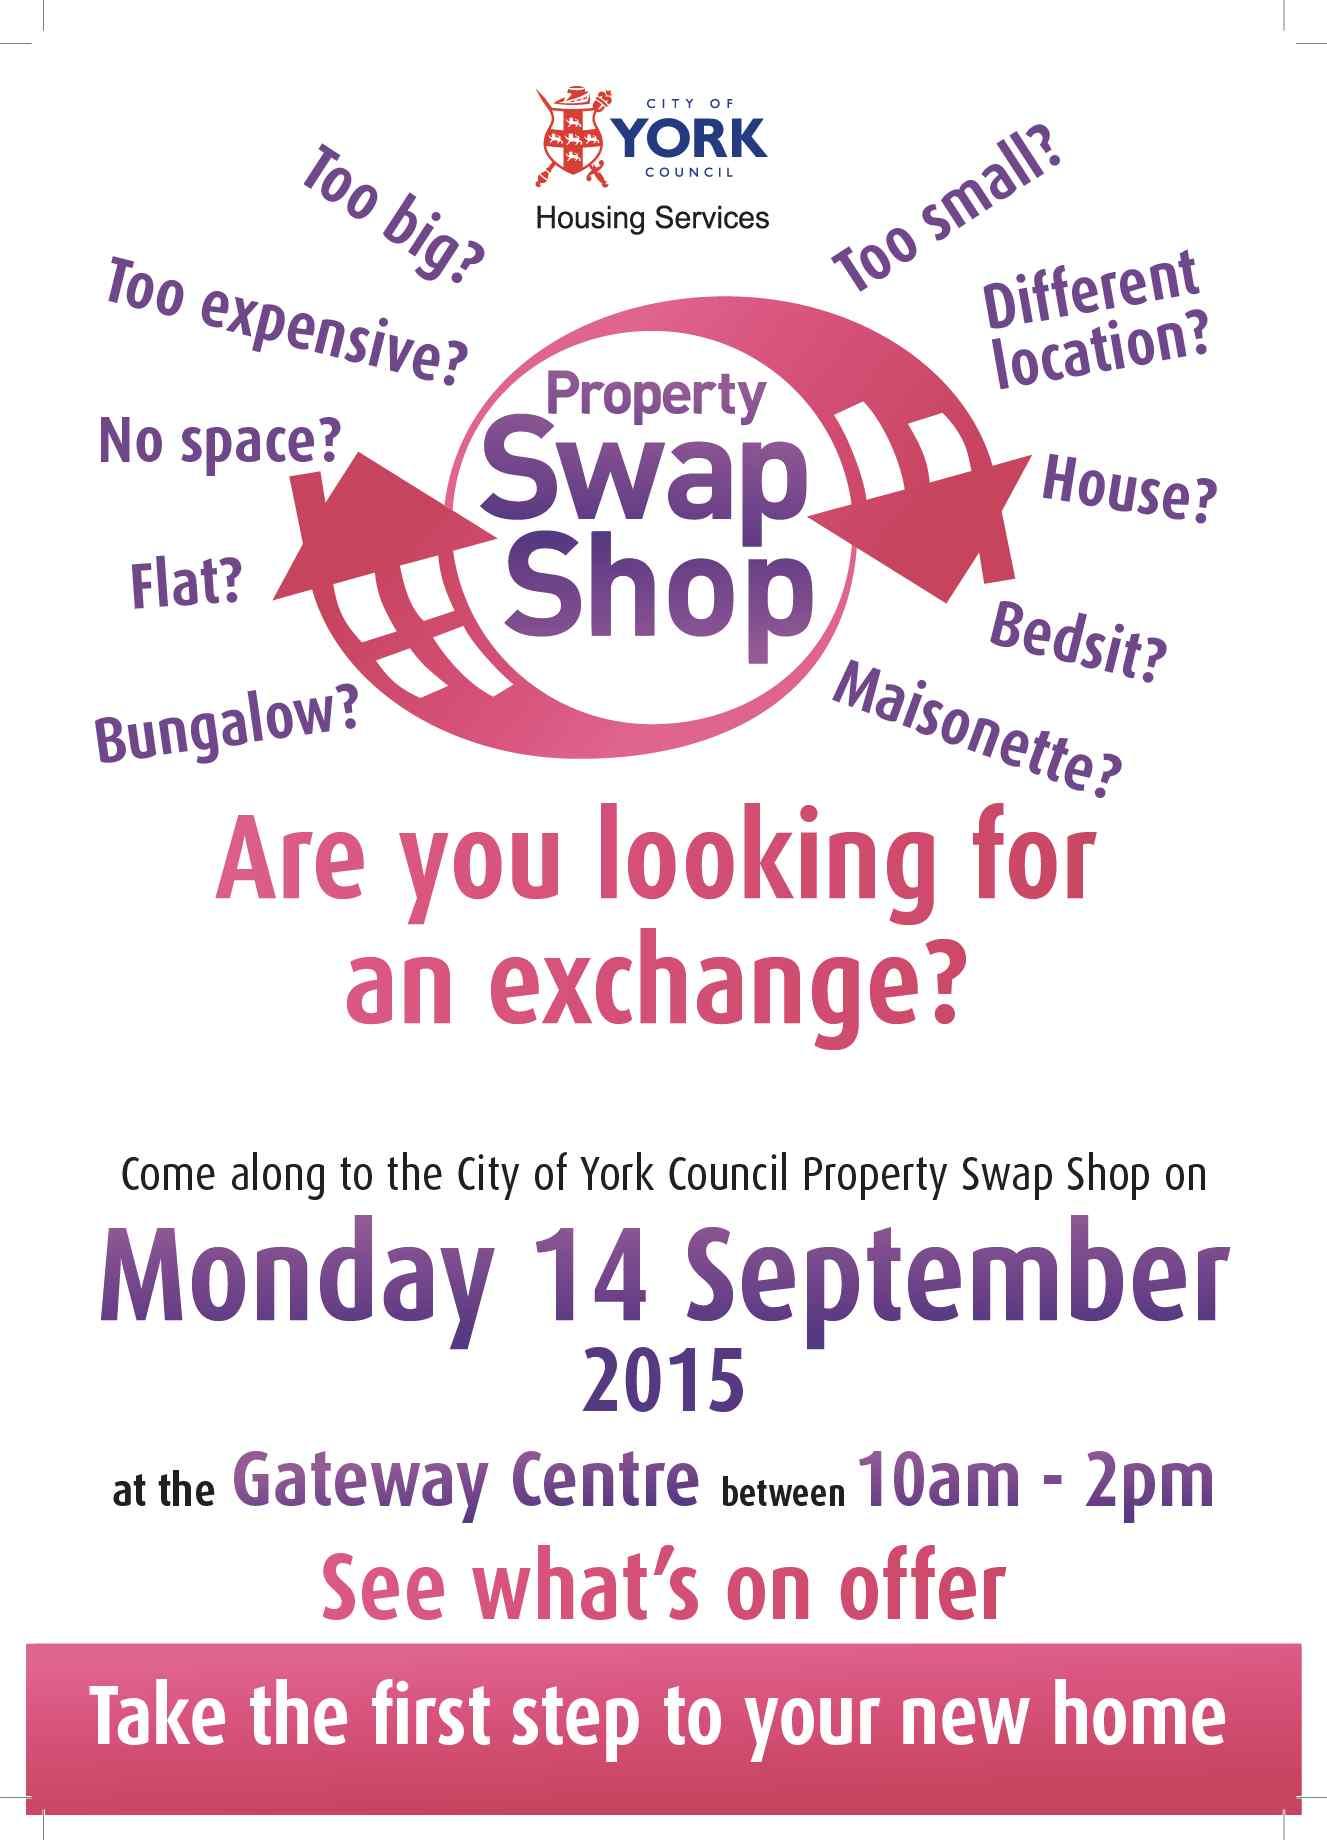 Property swap shop